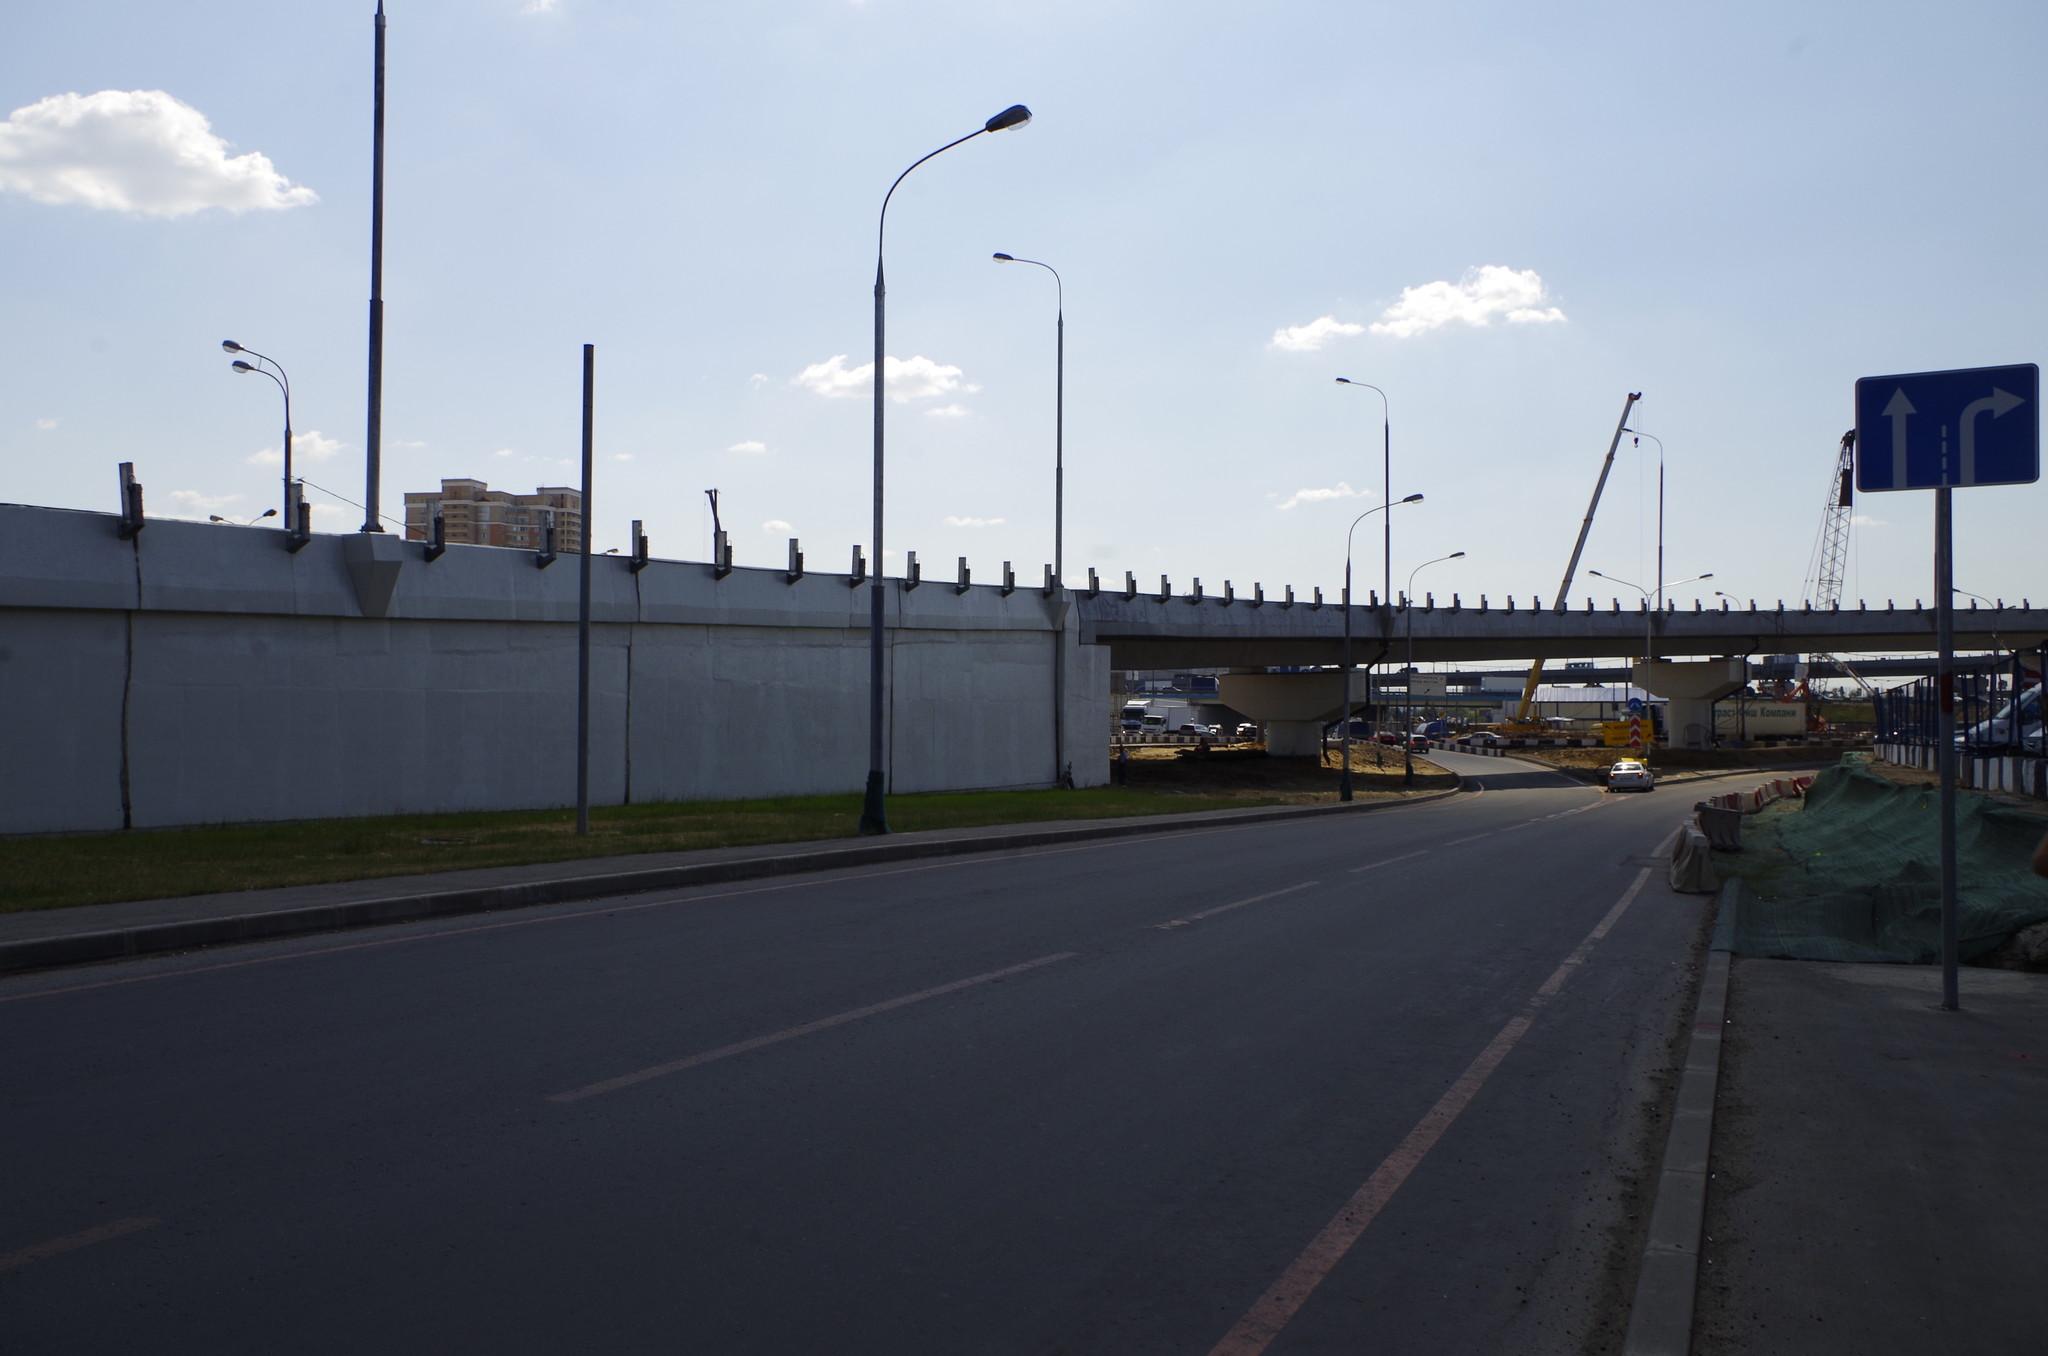 Транспортная развязка на пересечении МКАД с Дмитровским шоссе